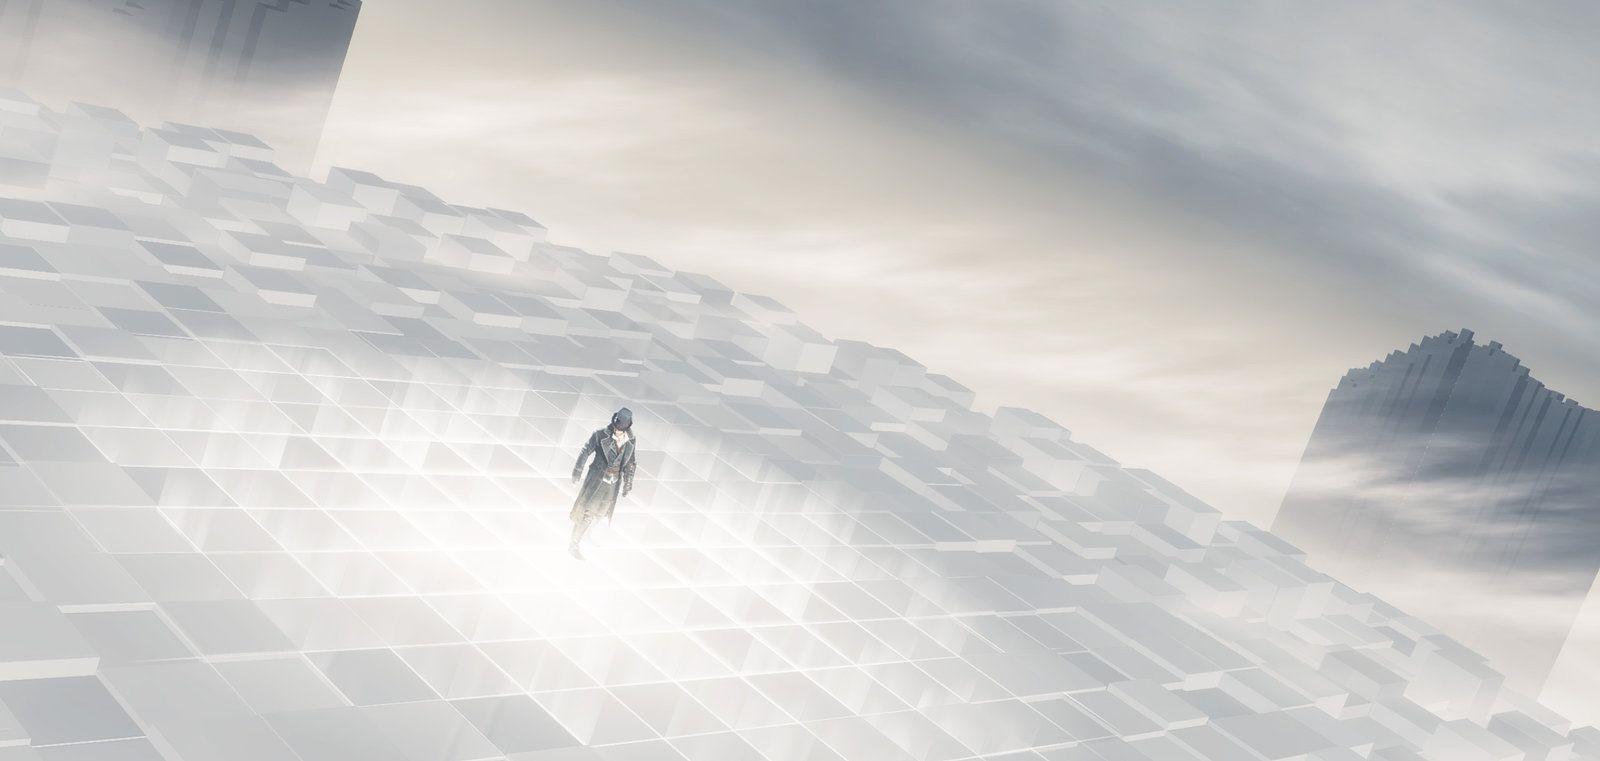 Assassin's Creed Hyper Scape Ubisoft